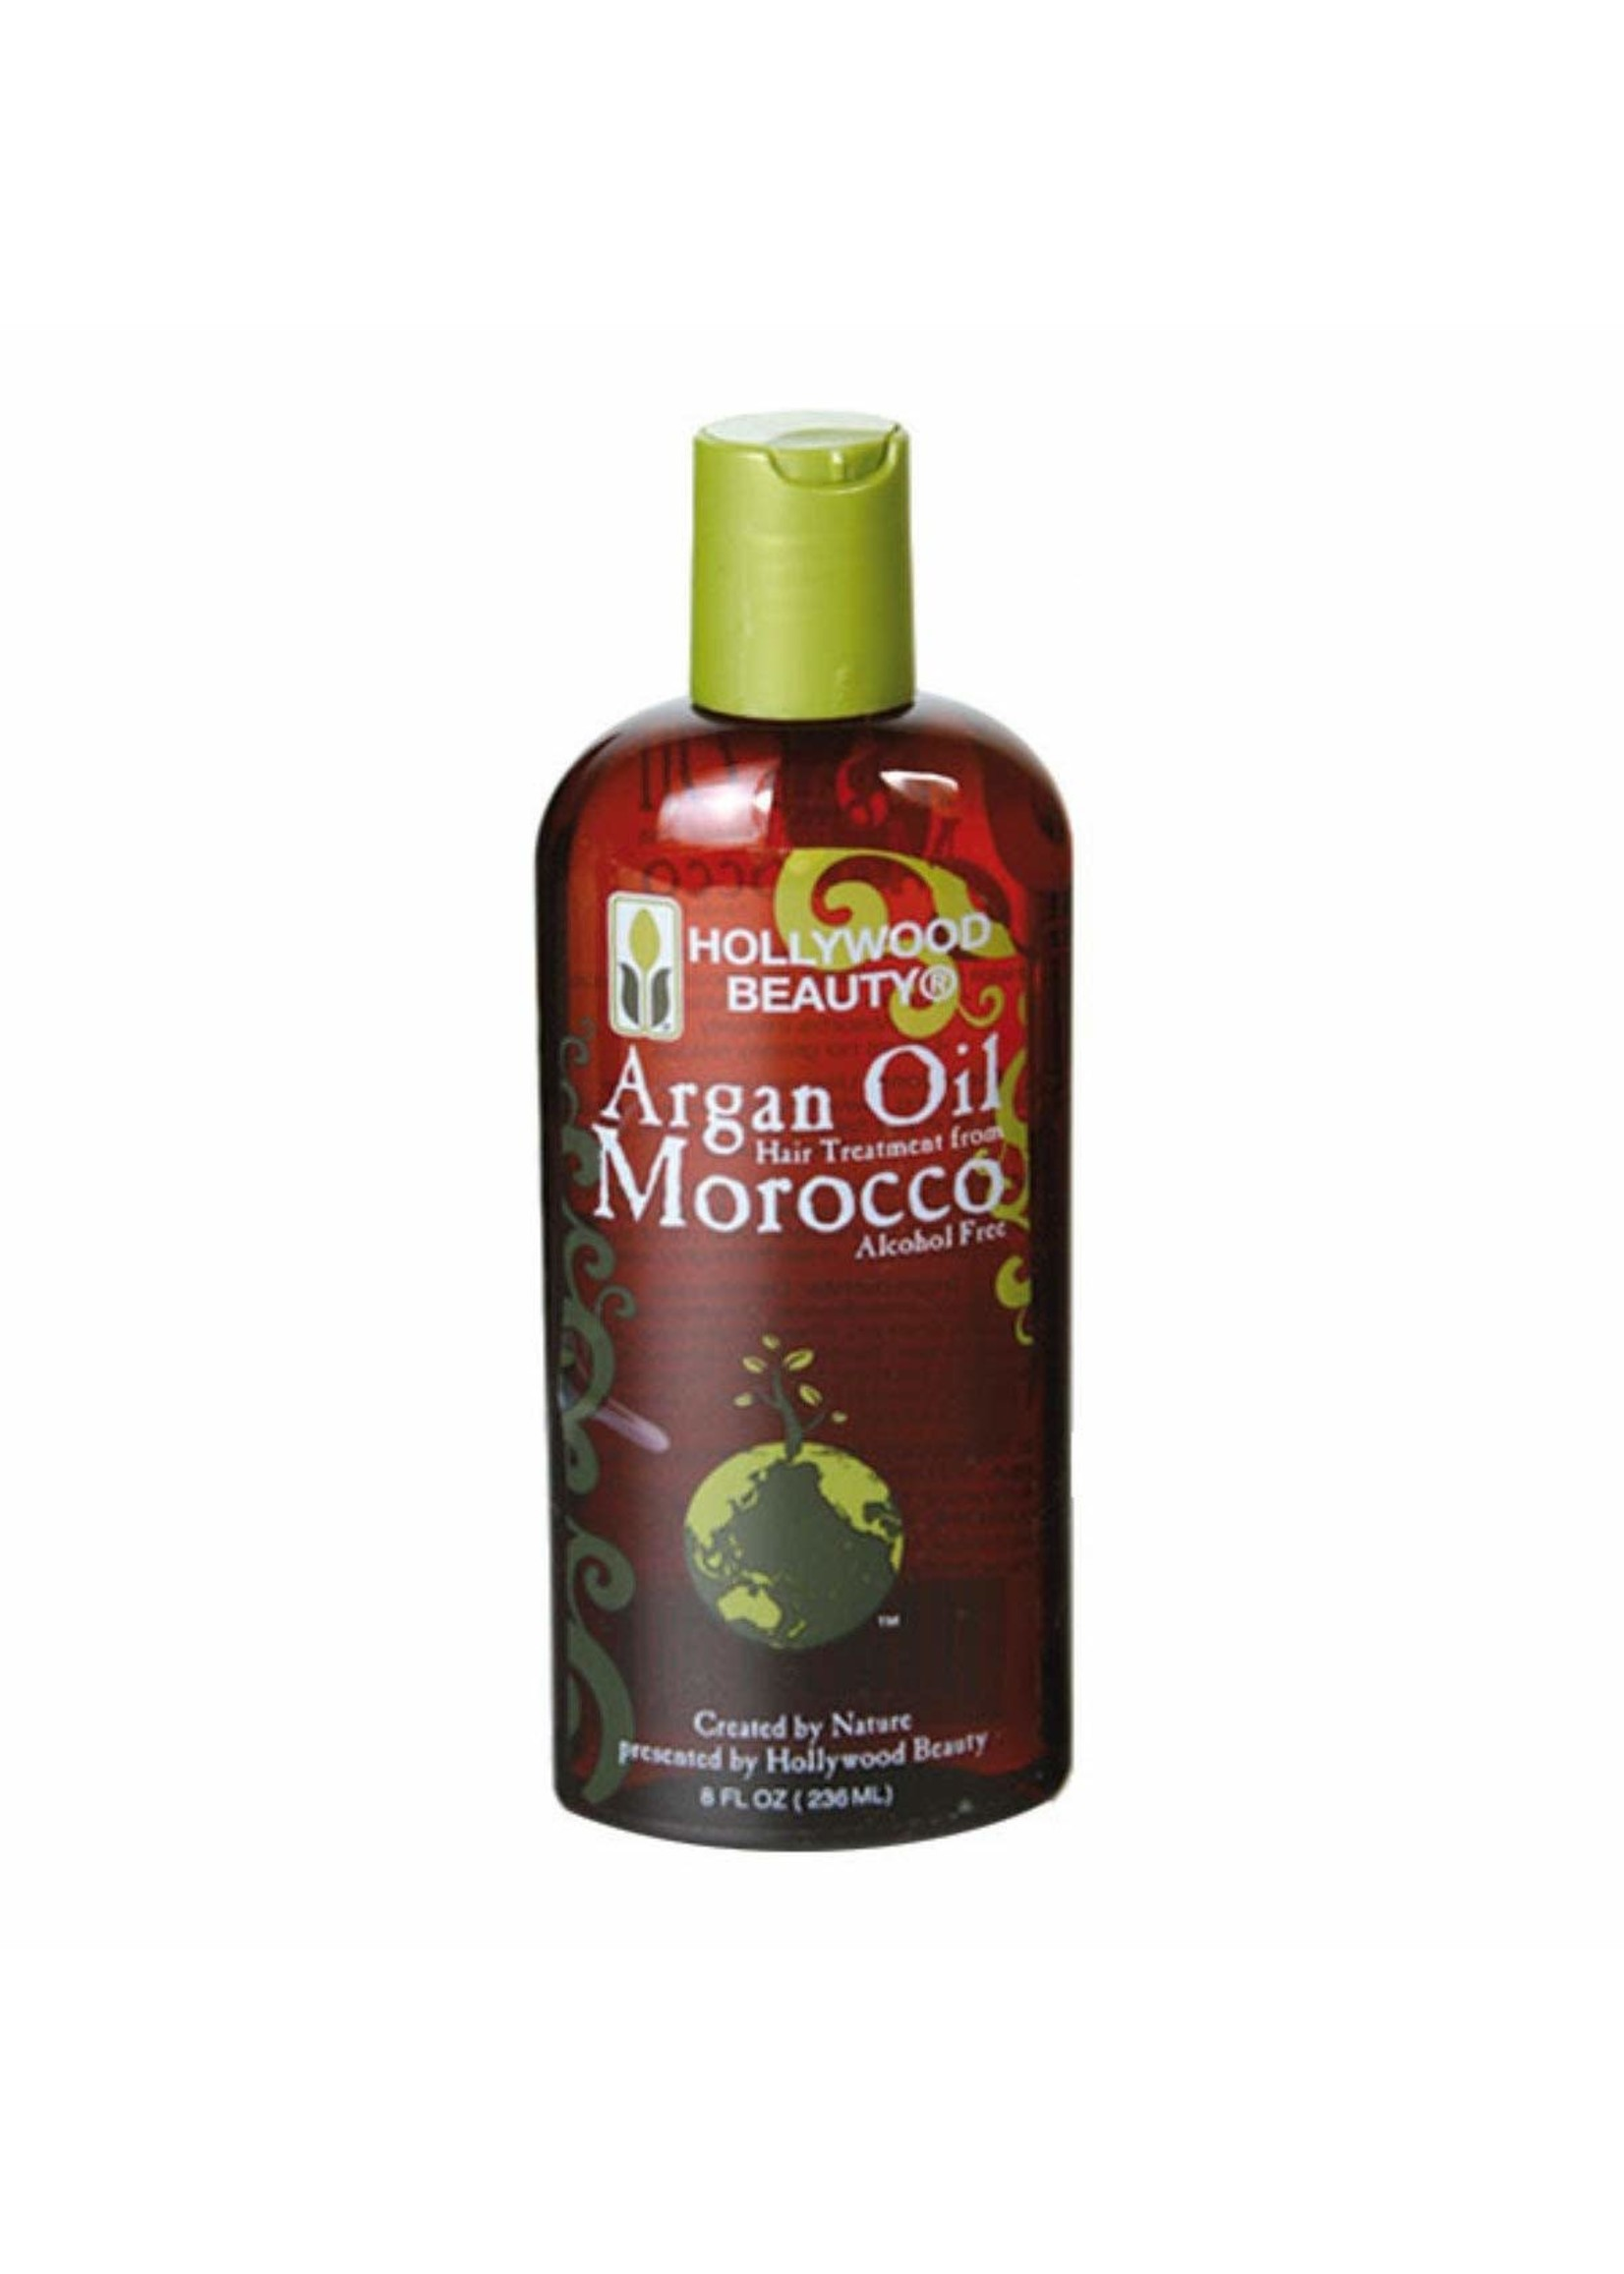 Hollywood Beauty Argan Oil Morocco Treatment 8oz